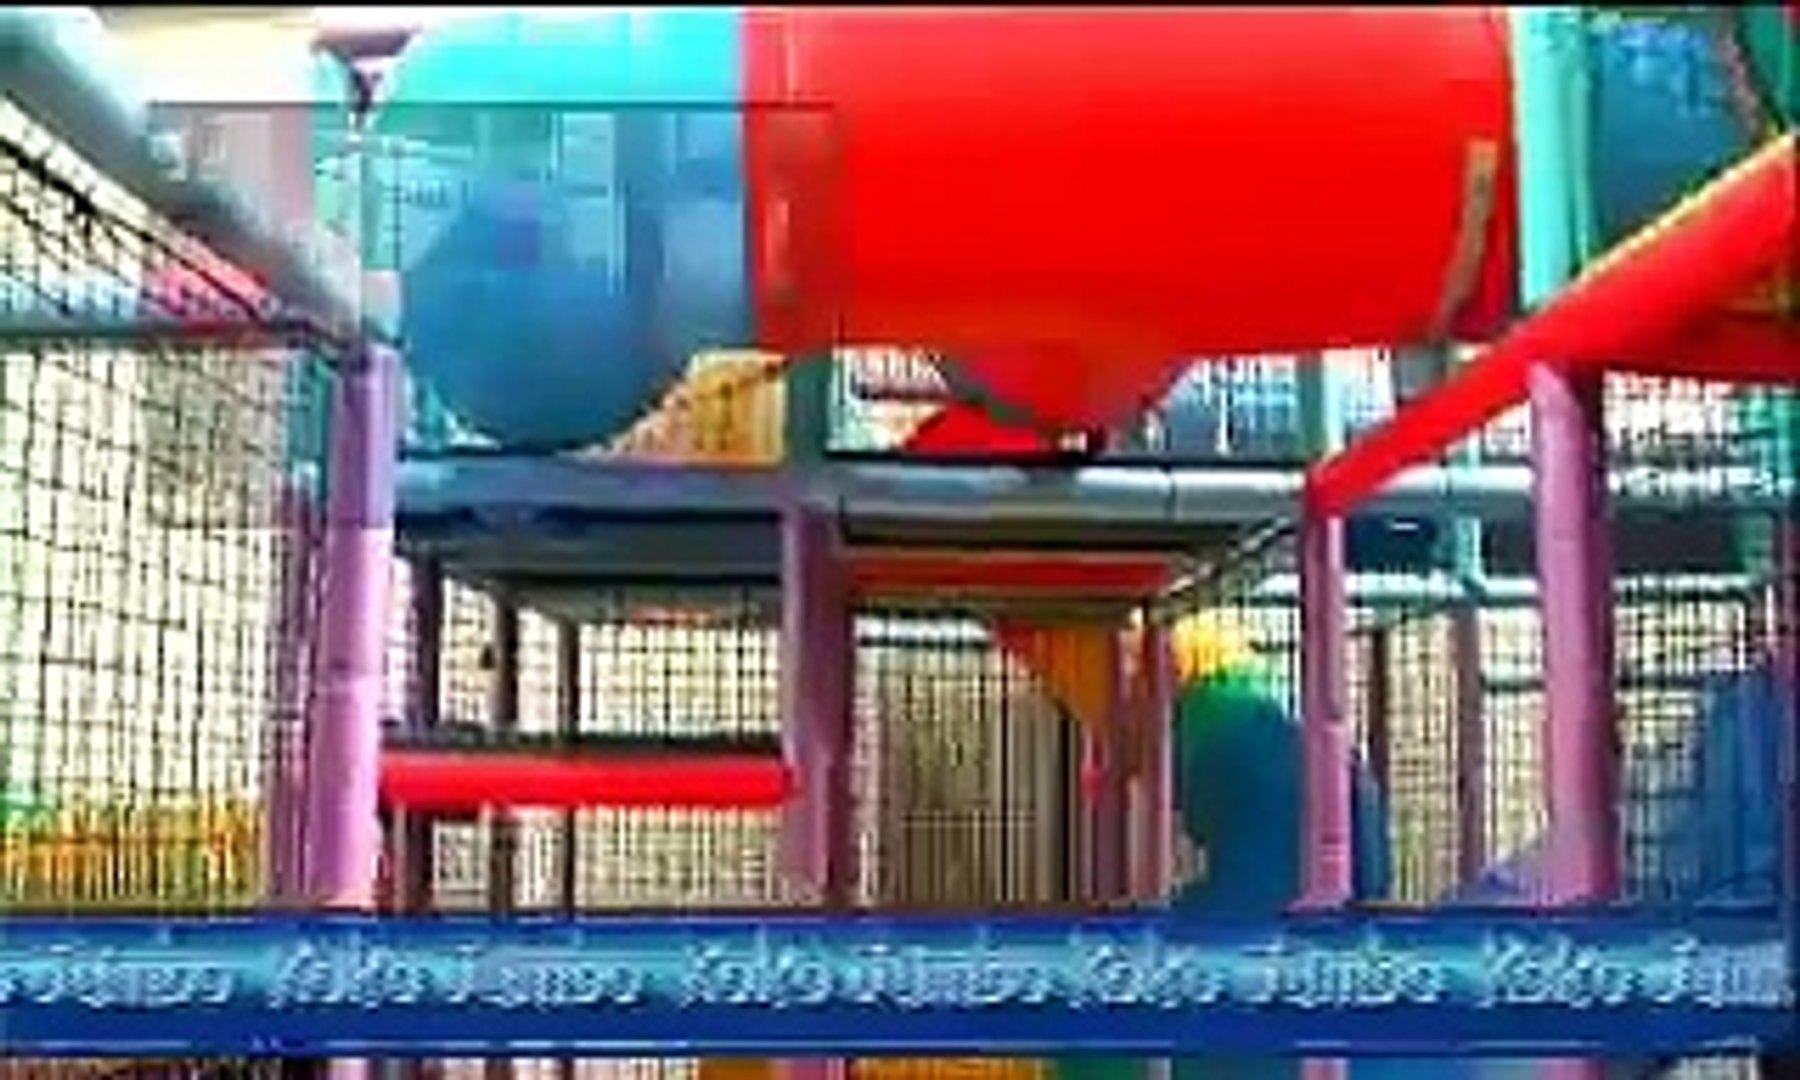 Koko Jumbo kids play centre